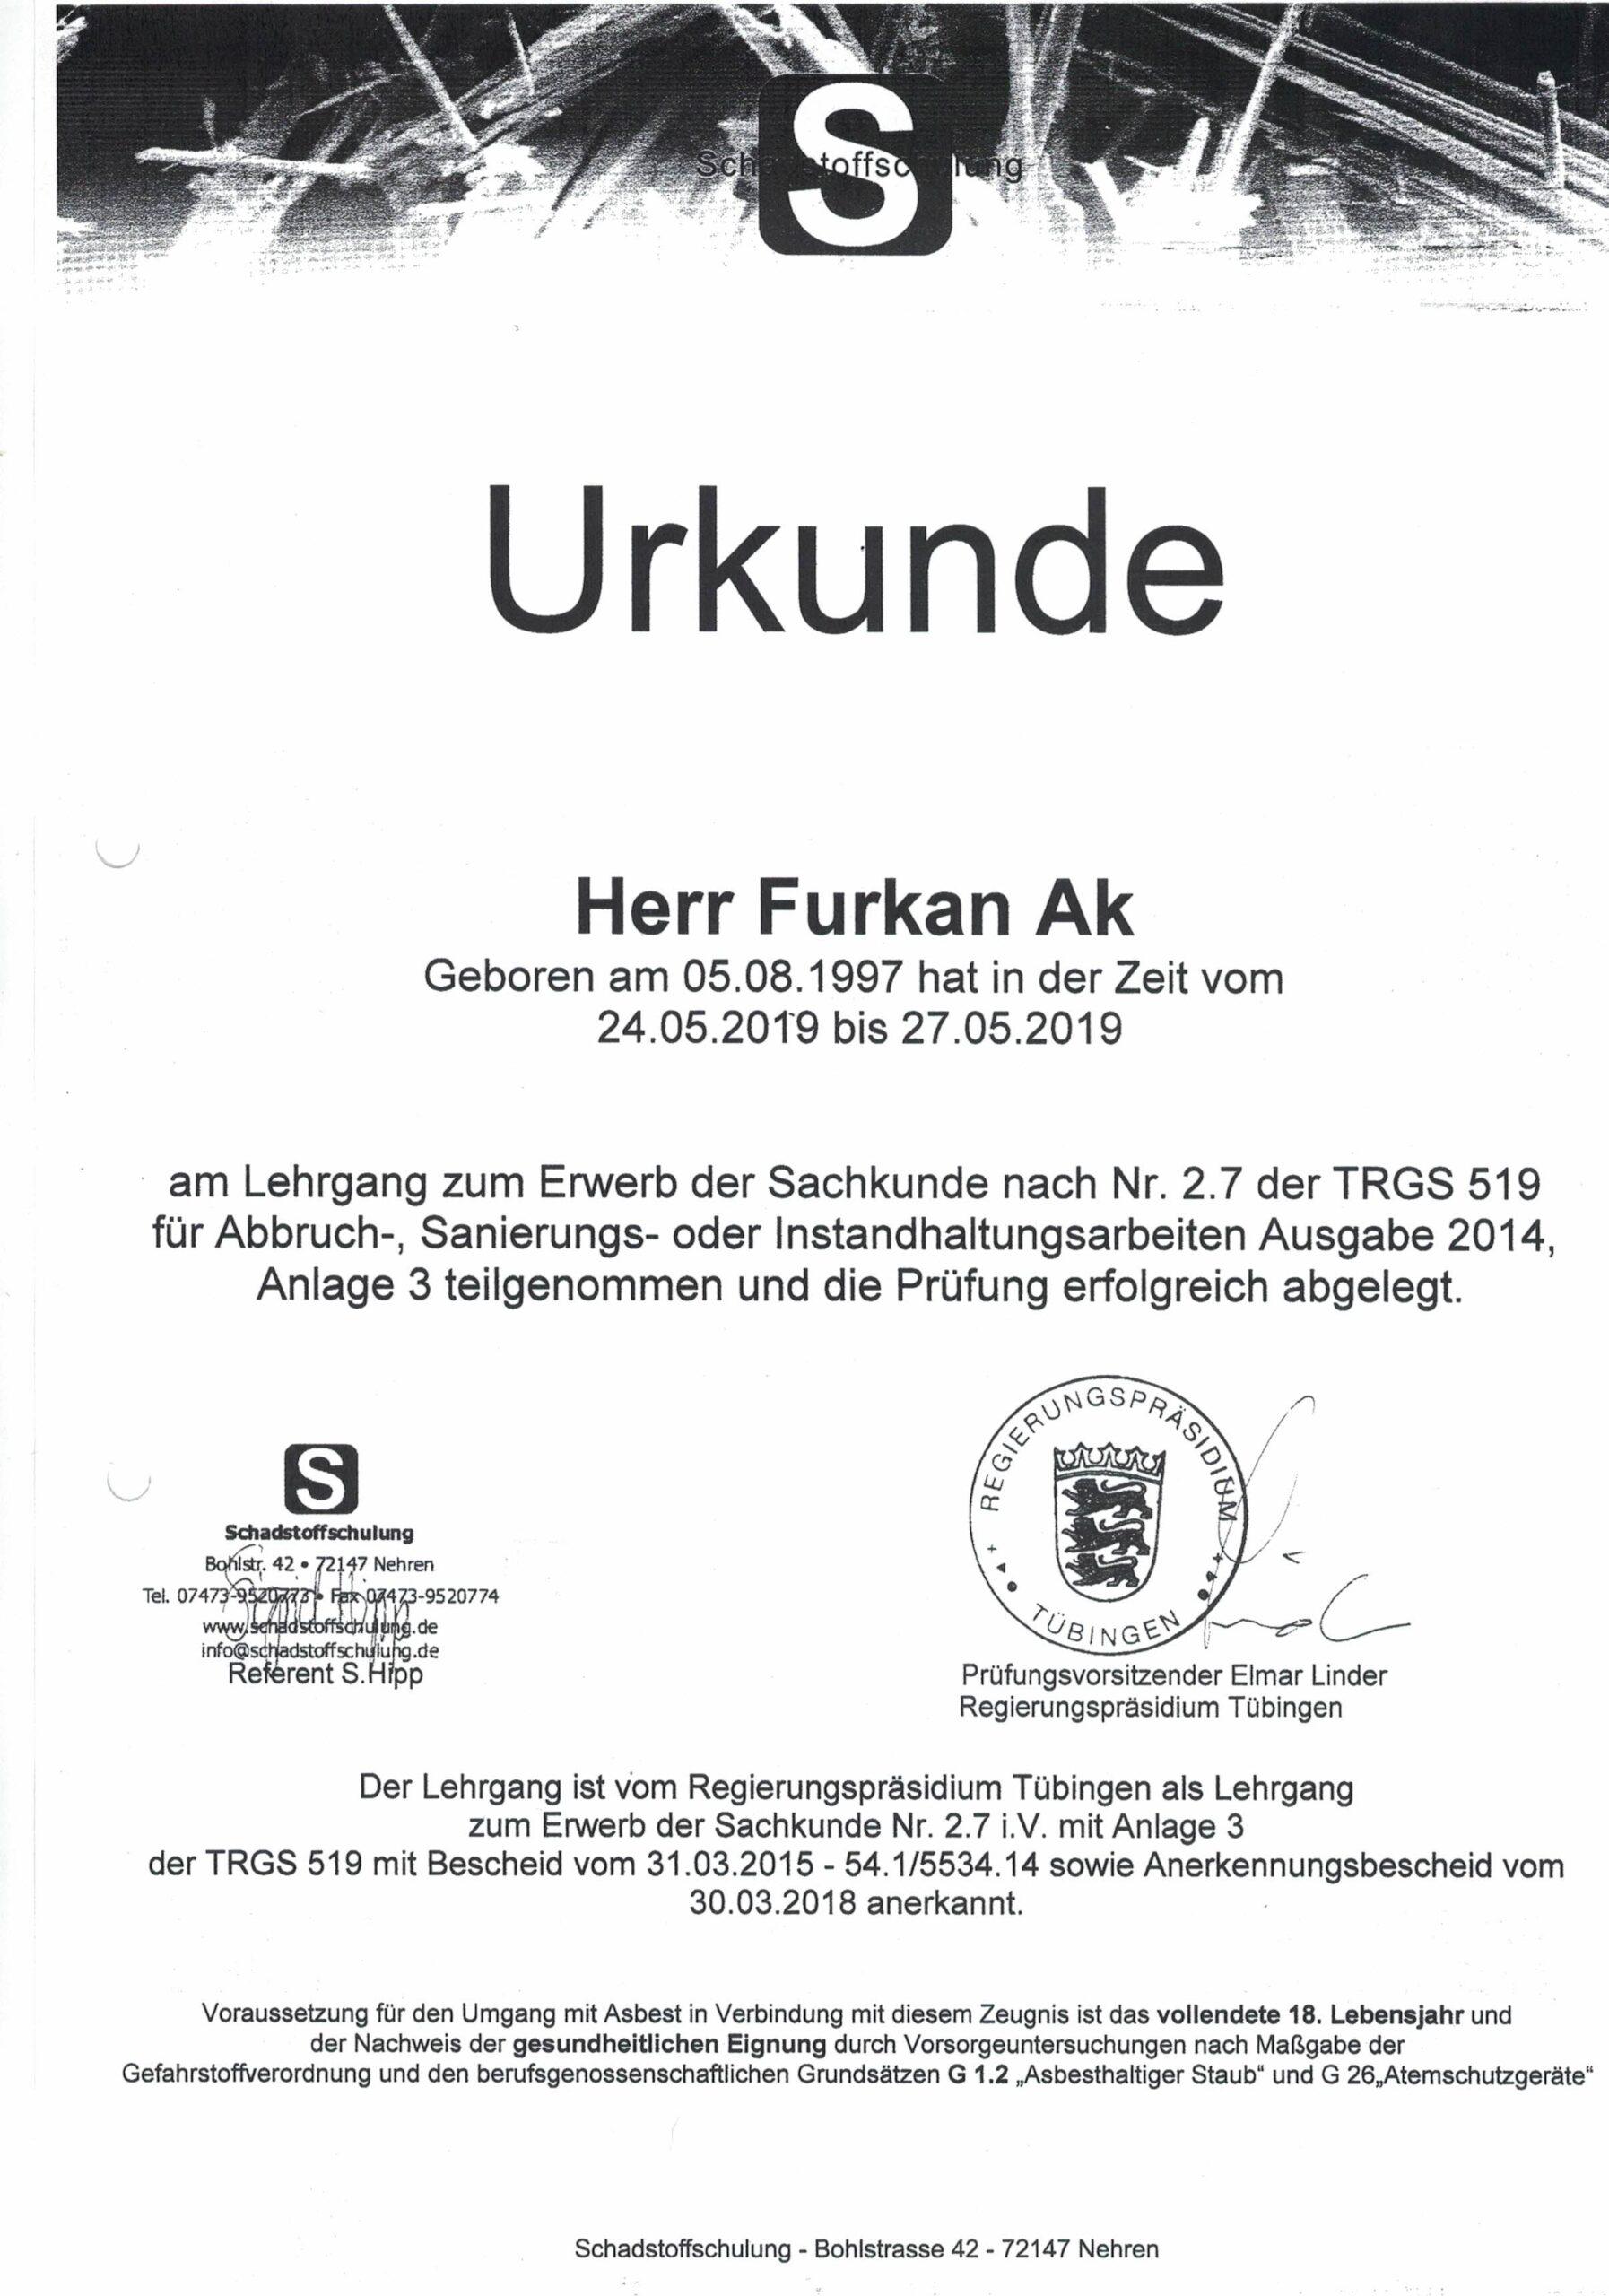 Urkunde Furkan